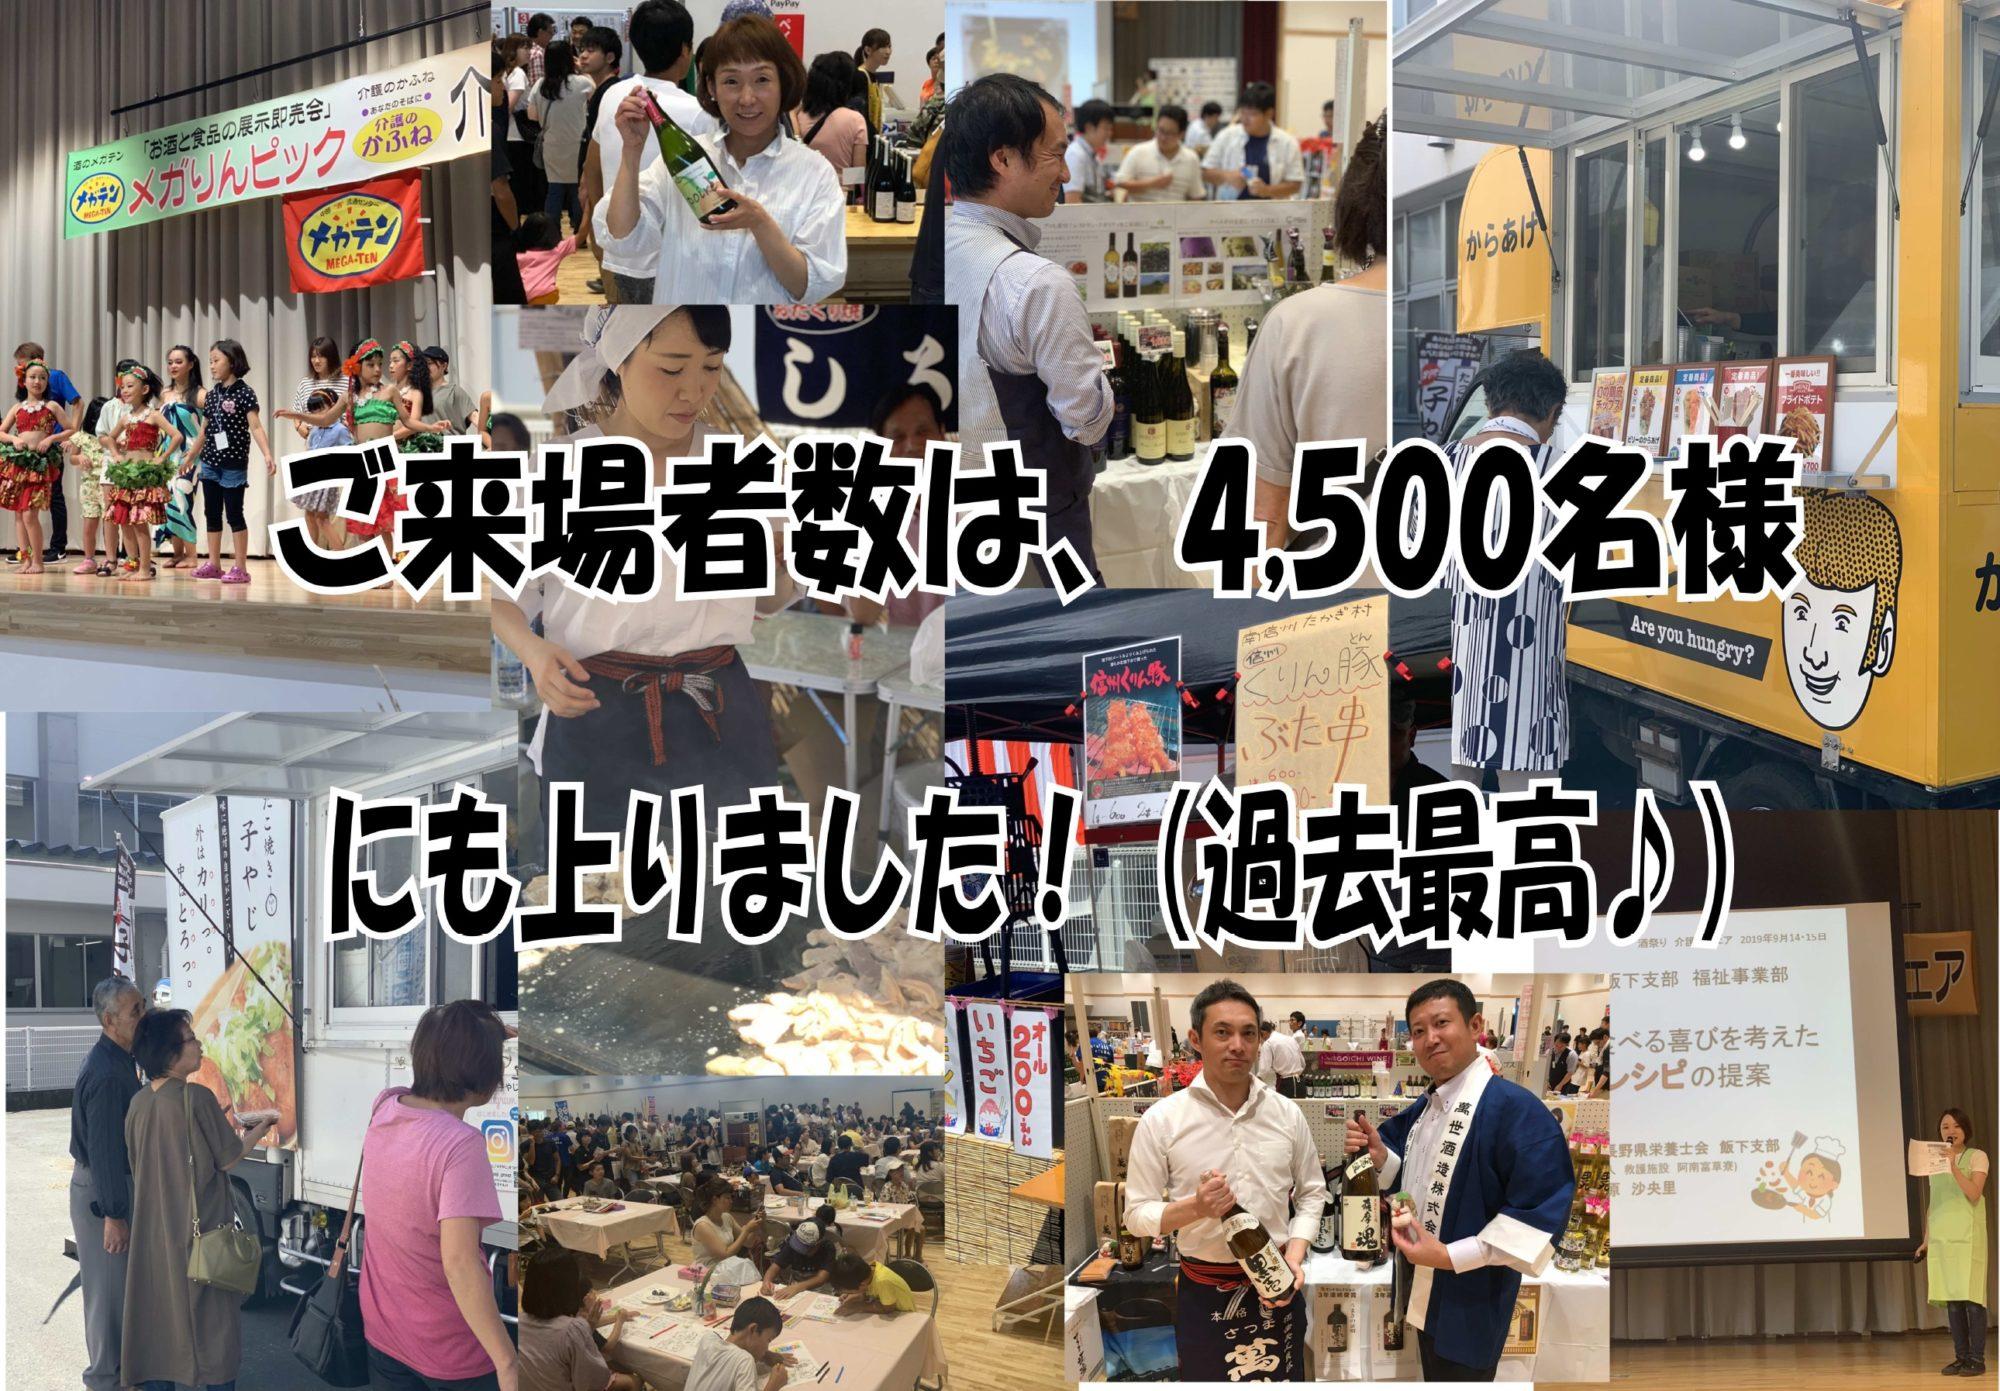 2019年9月14日~2019年9月15日 酒祭り無事閉幕!(2)